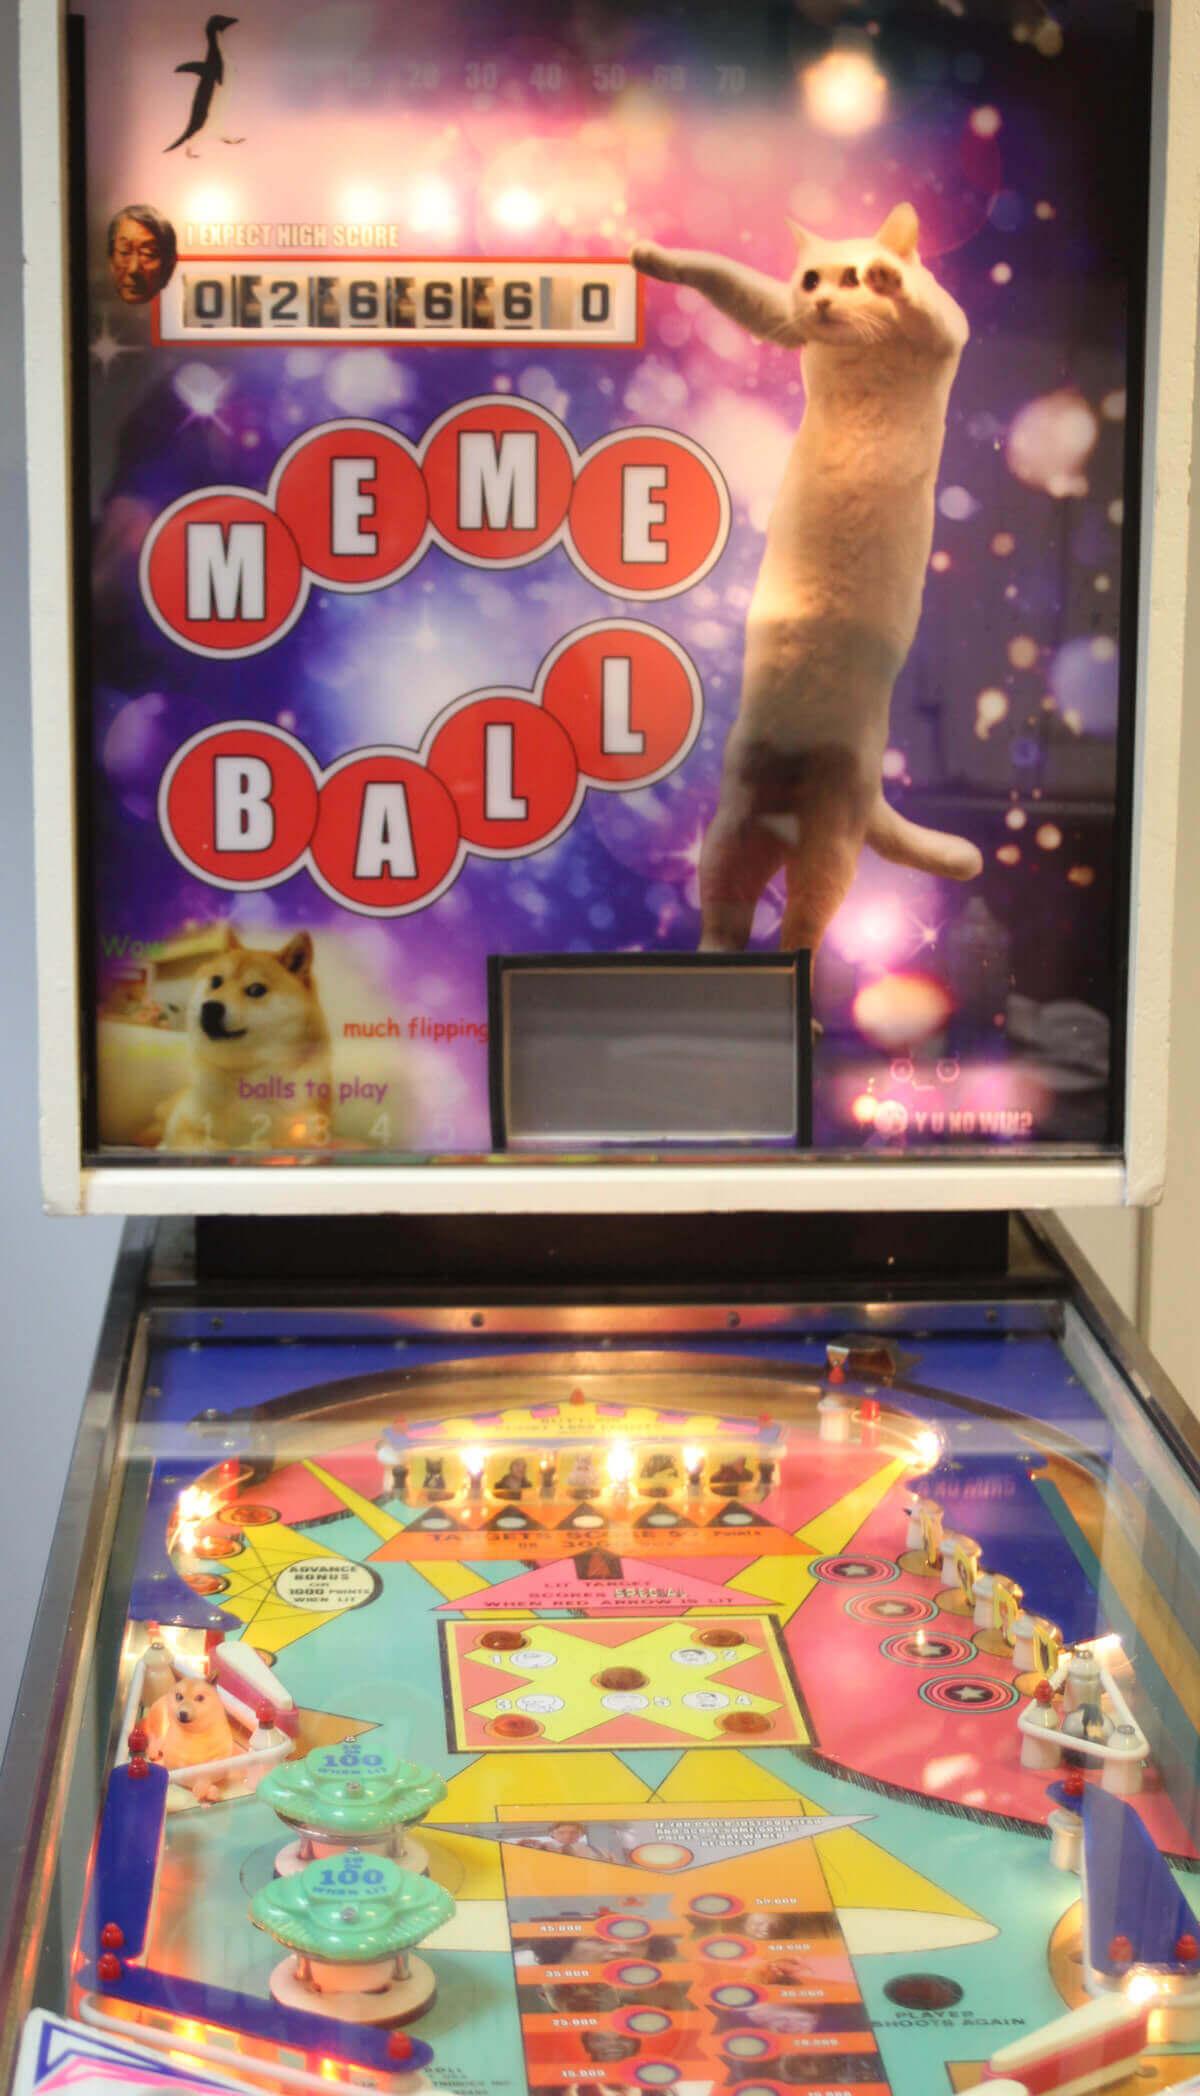 Star Wars Pinball Machine >> We Made an Internet Meme Themed Pinball - Liberty Games Blog